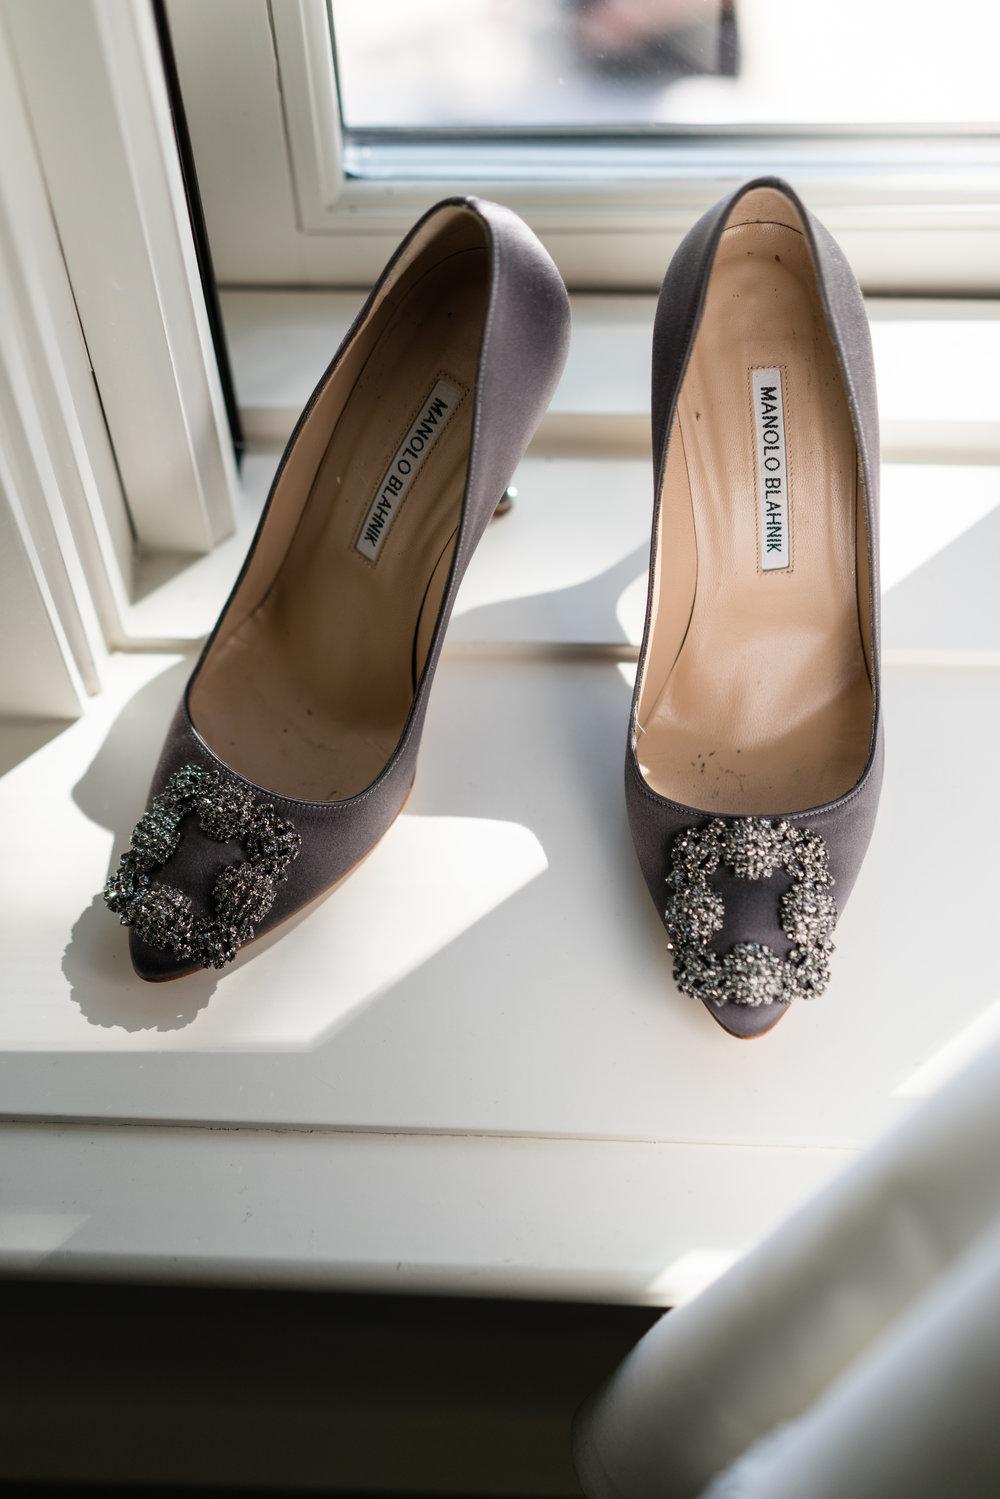 Shoe Details - Dallas, Tx - Fall Wedding - Julian Leaver Events